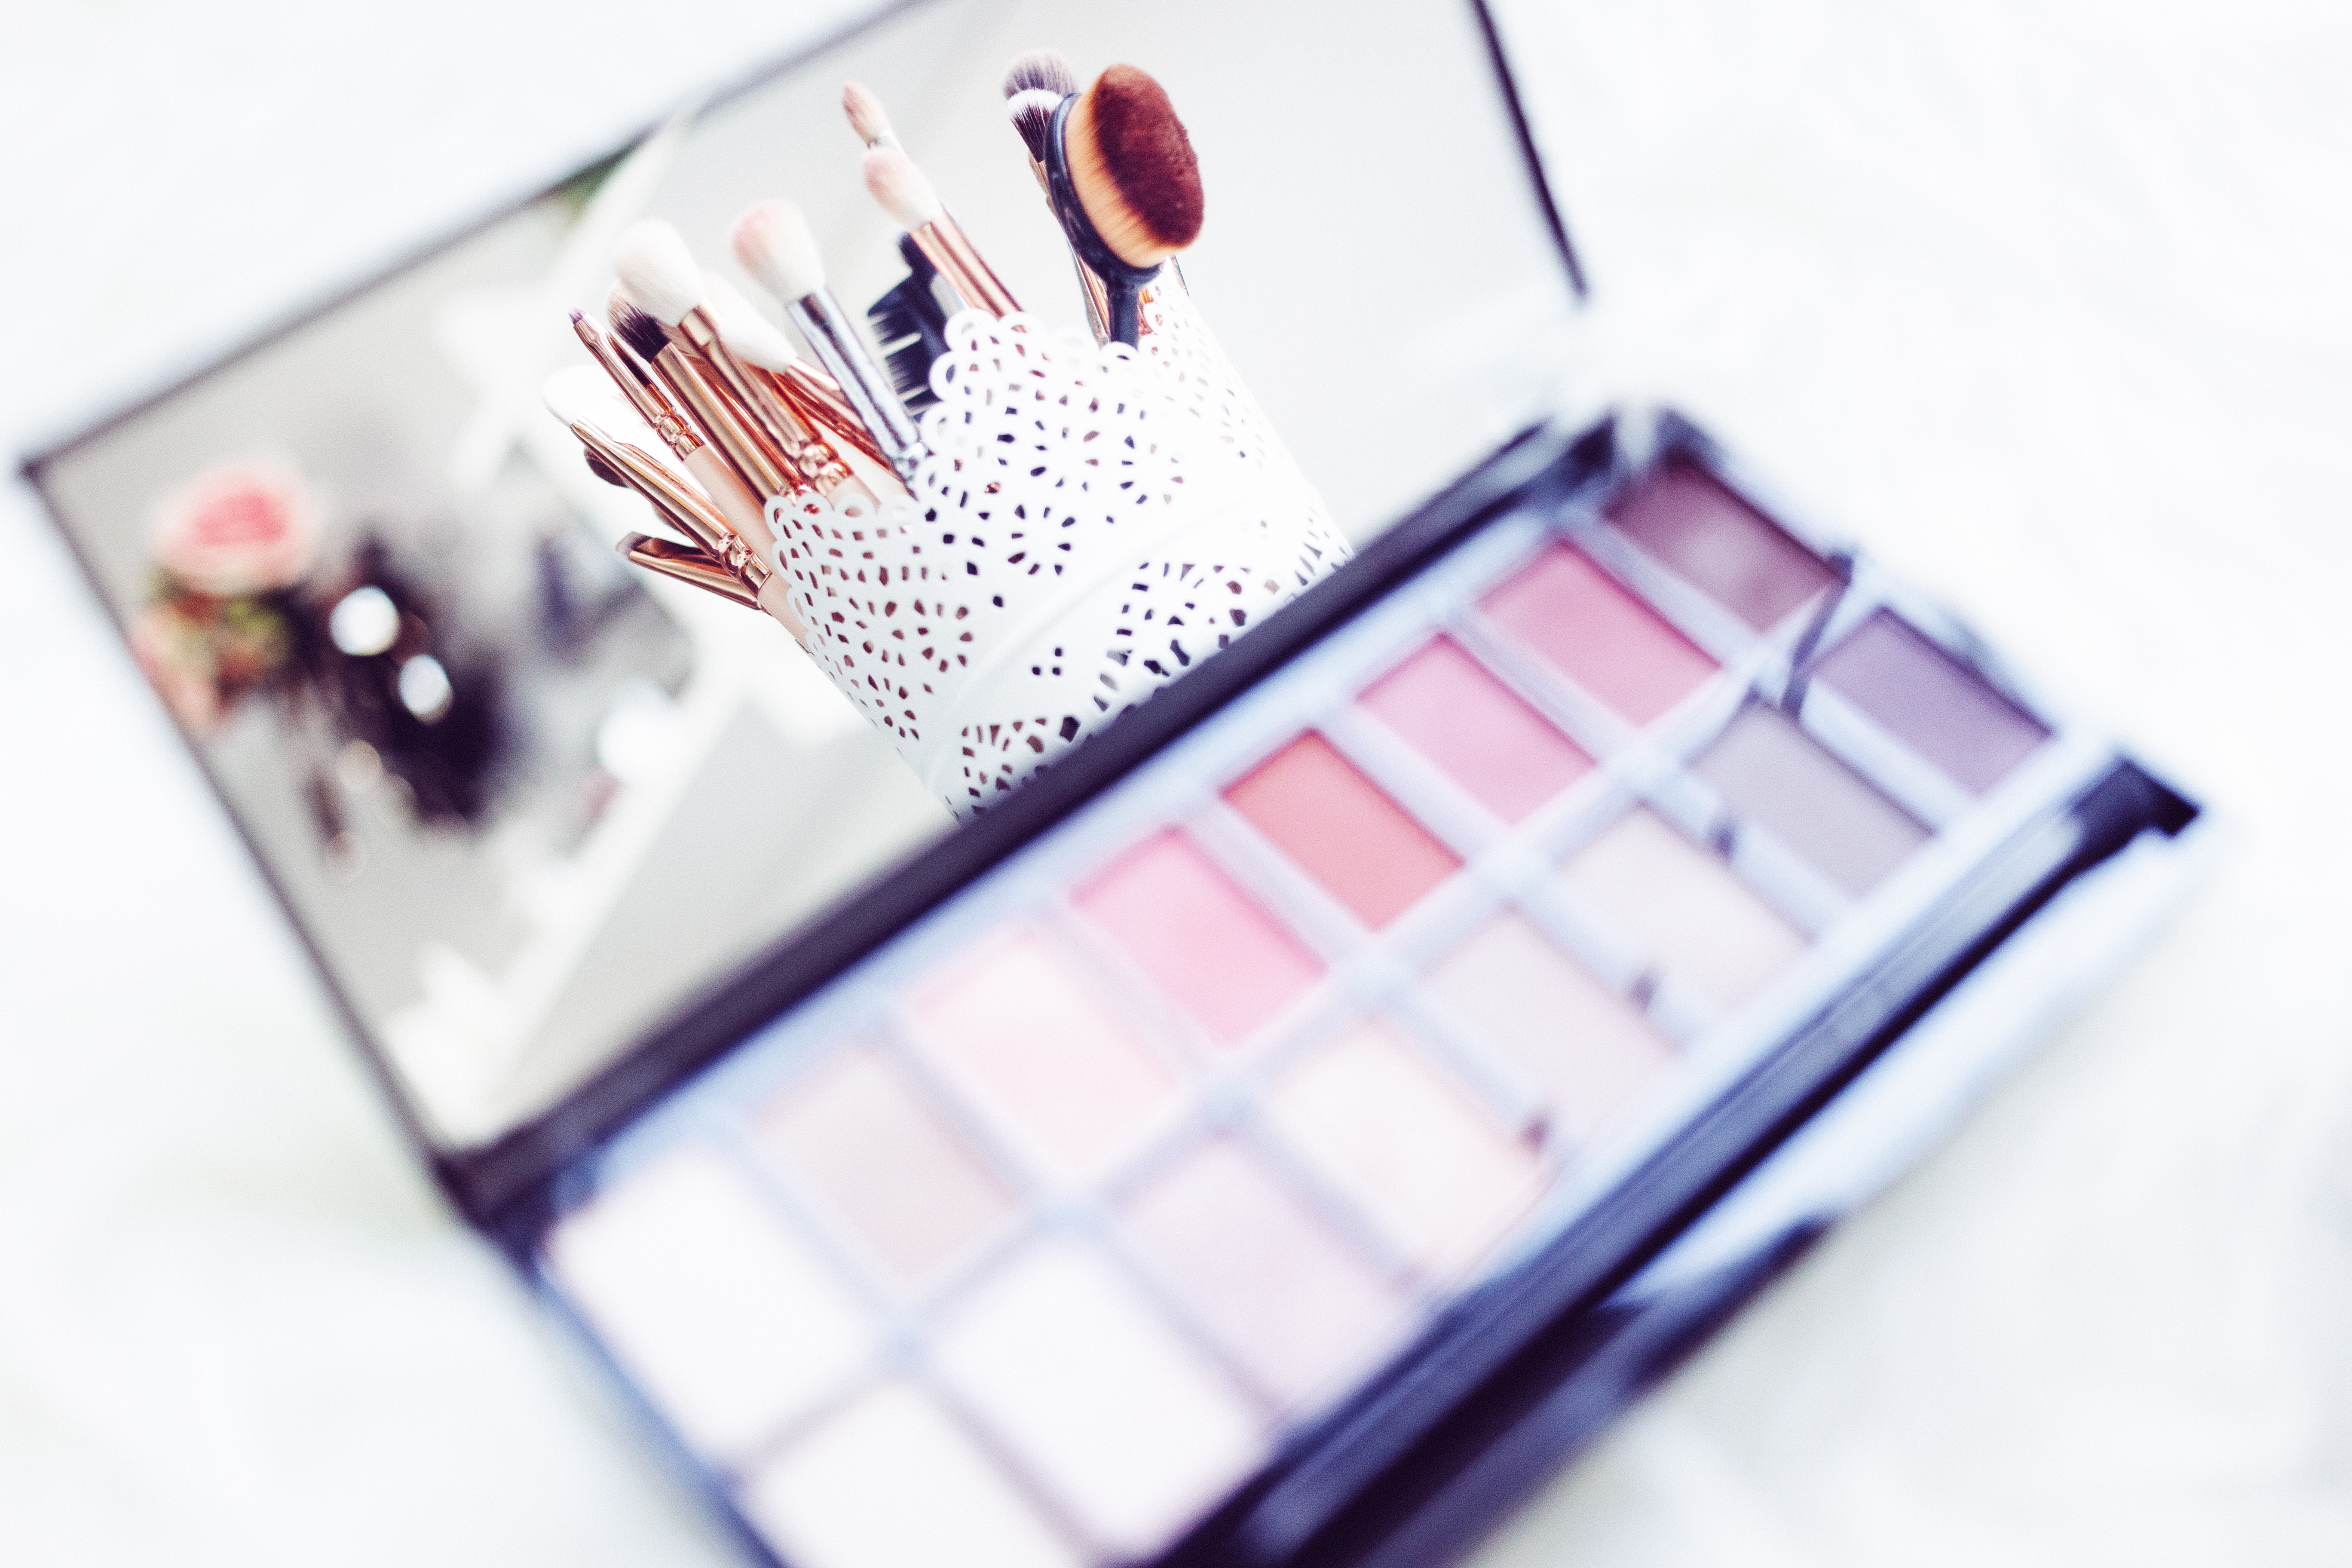 Best Makeup Storage Ideas  sc 1 st  New Lune & Best Makeup Storage Ideas u2013 New Lune